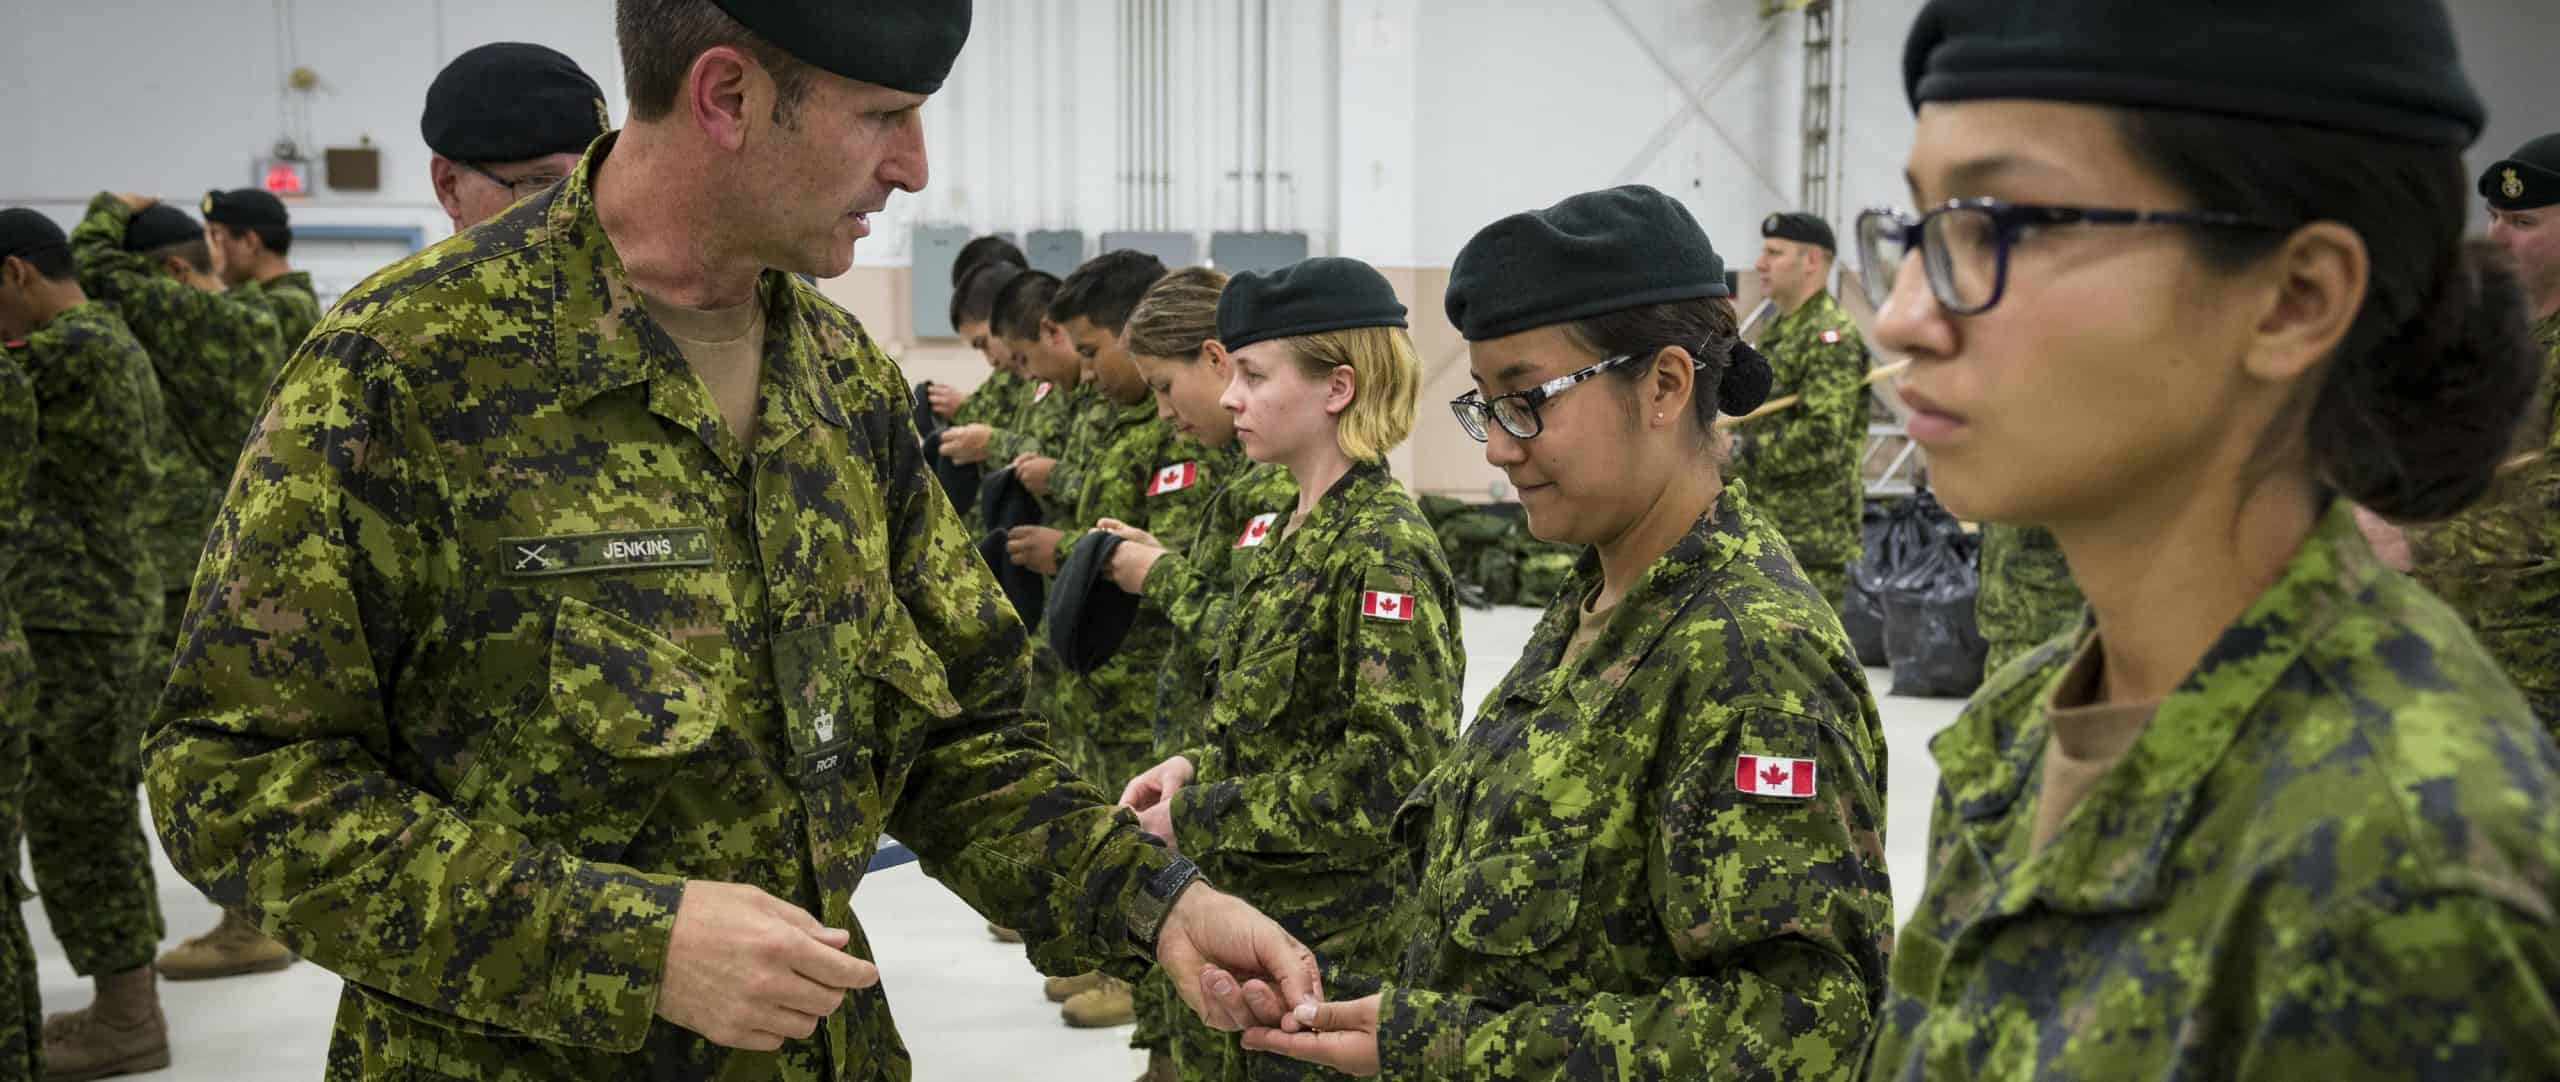 women_in_military